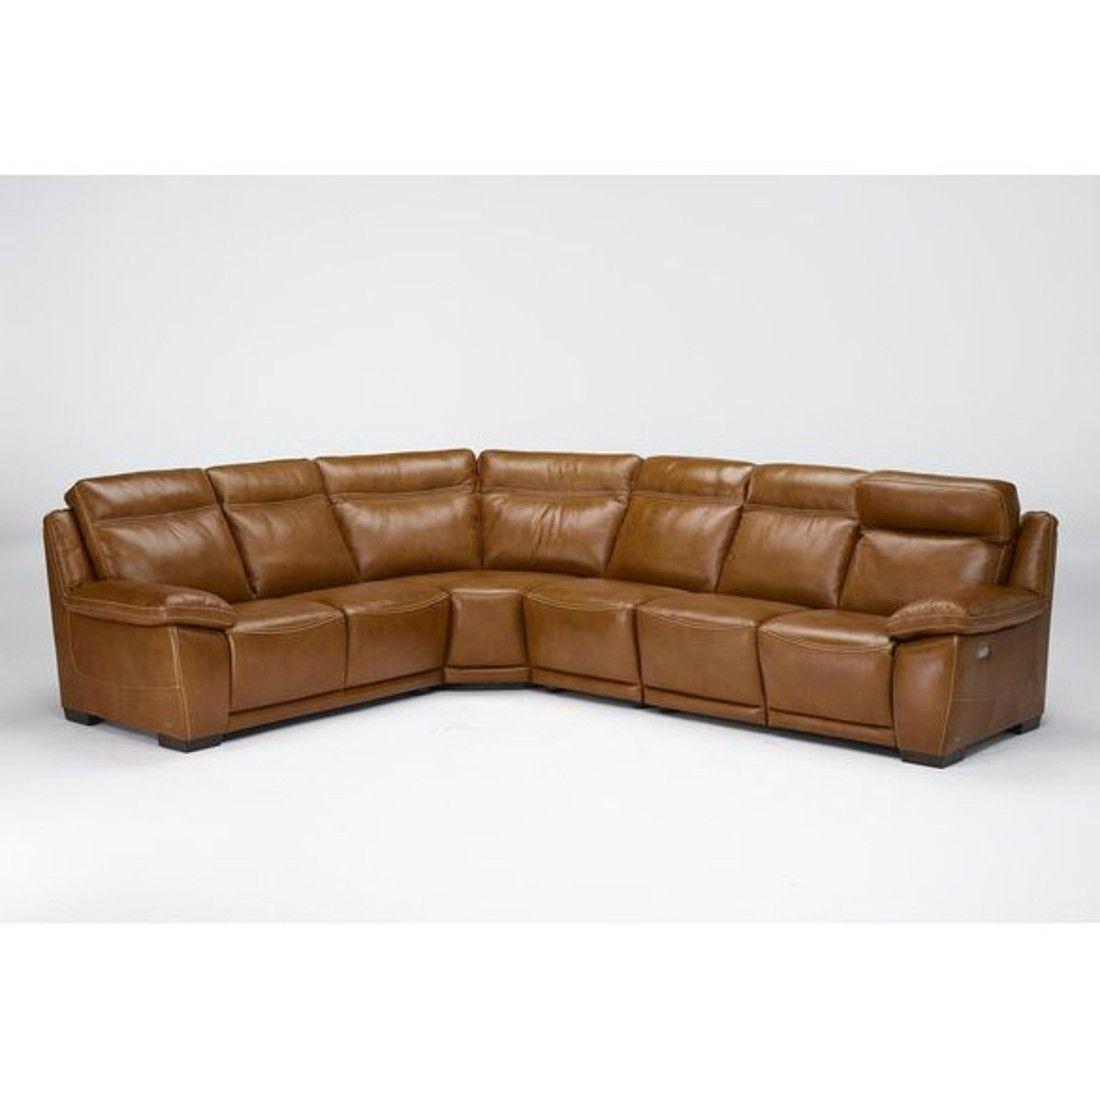 Sectional Sofa Sectional sofa